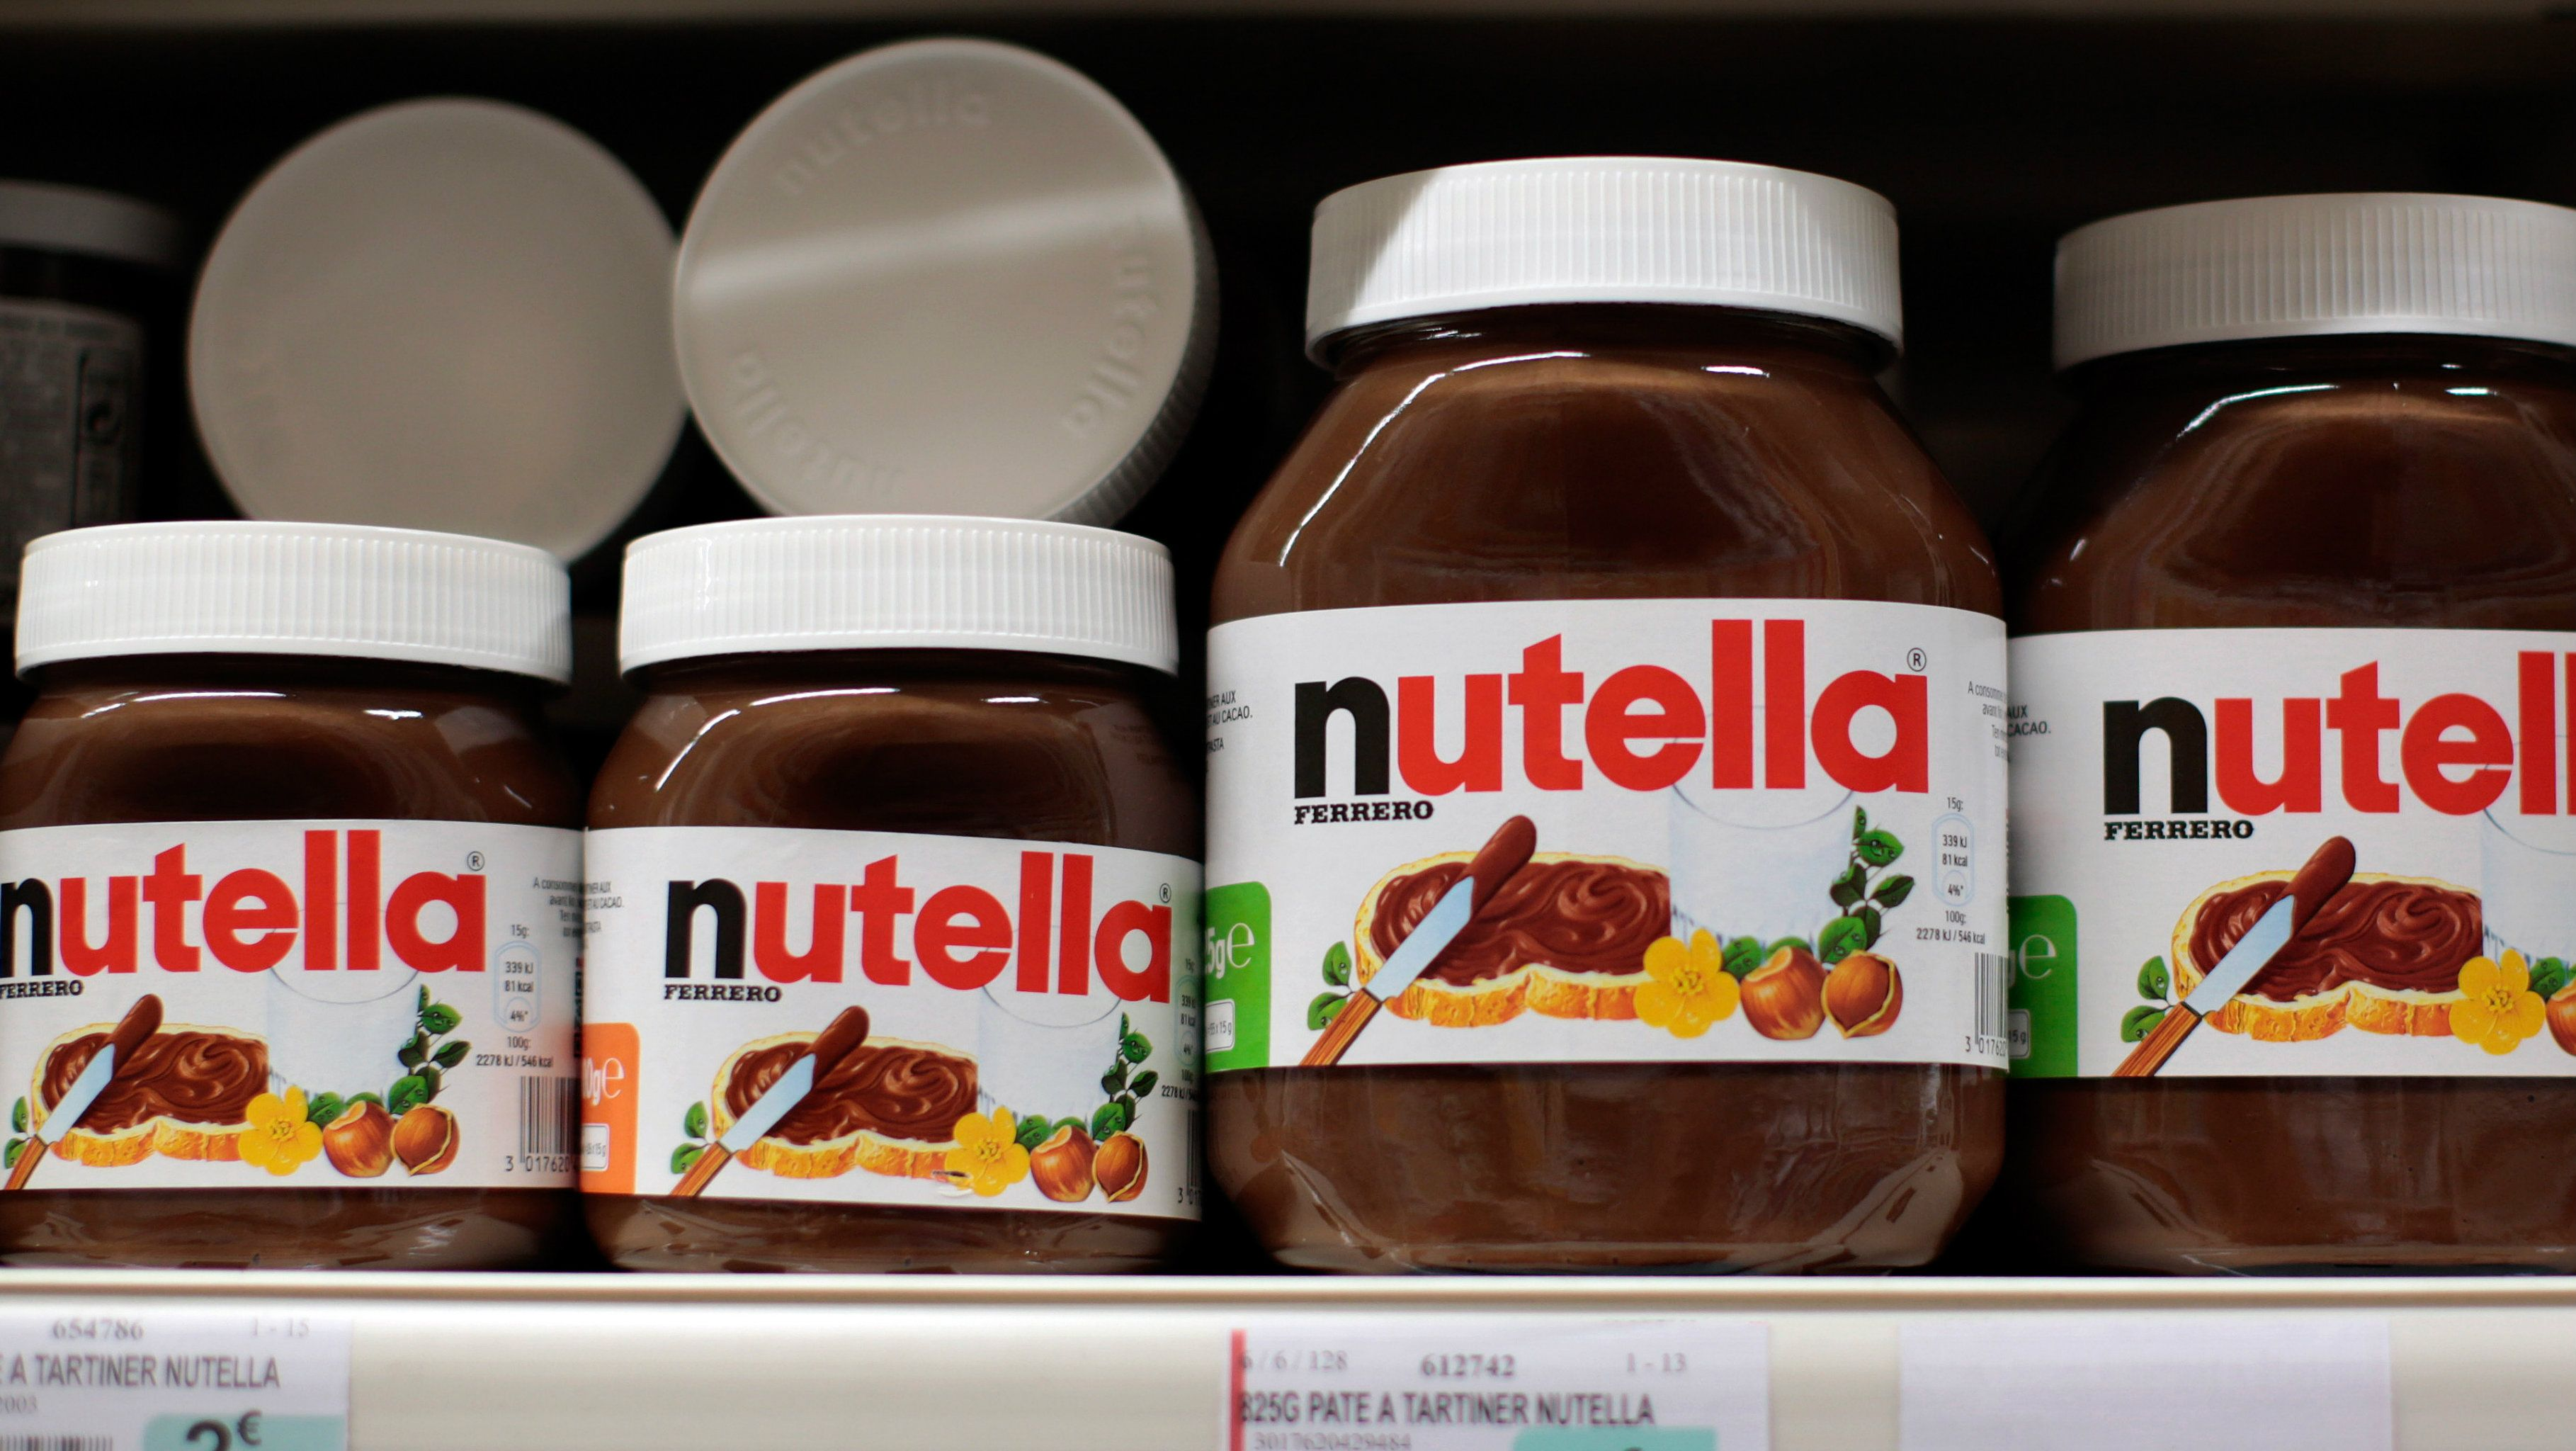 Offerte Lavoro Ferrero - To Whom It May Concern Letter